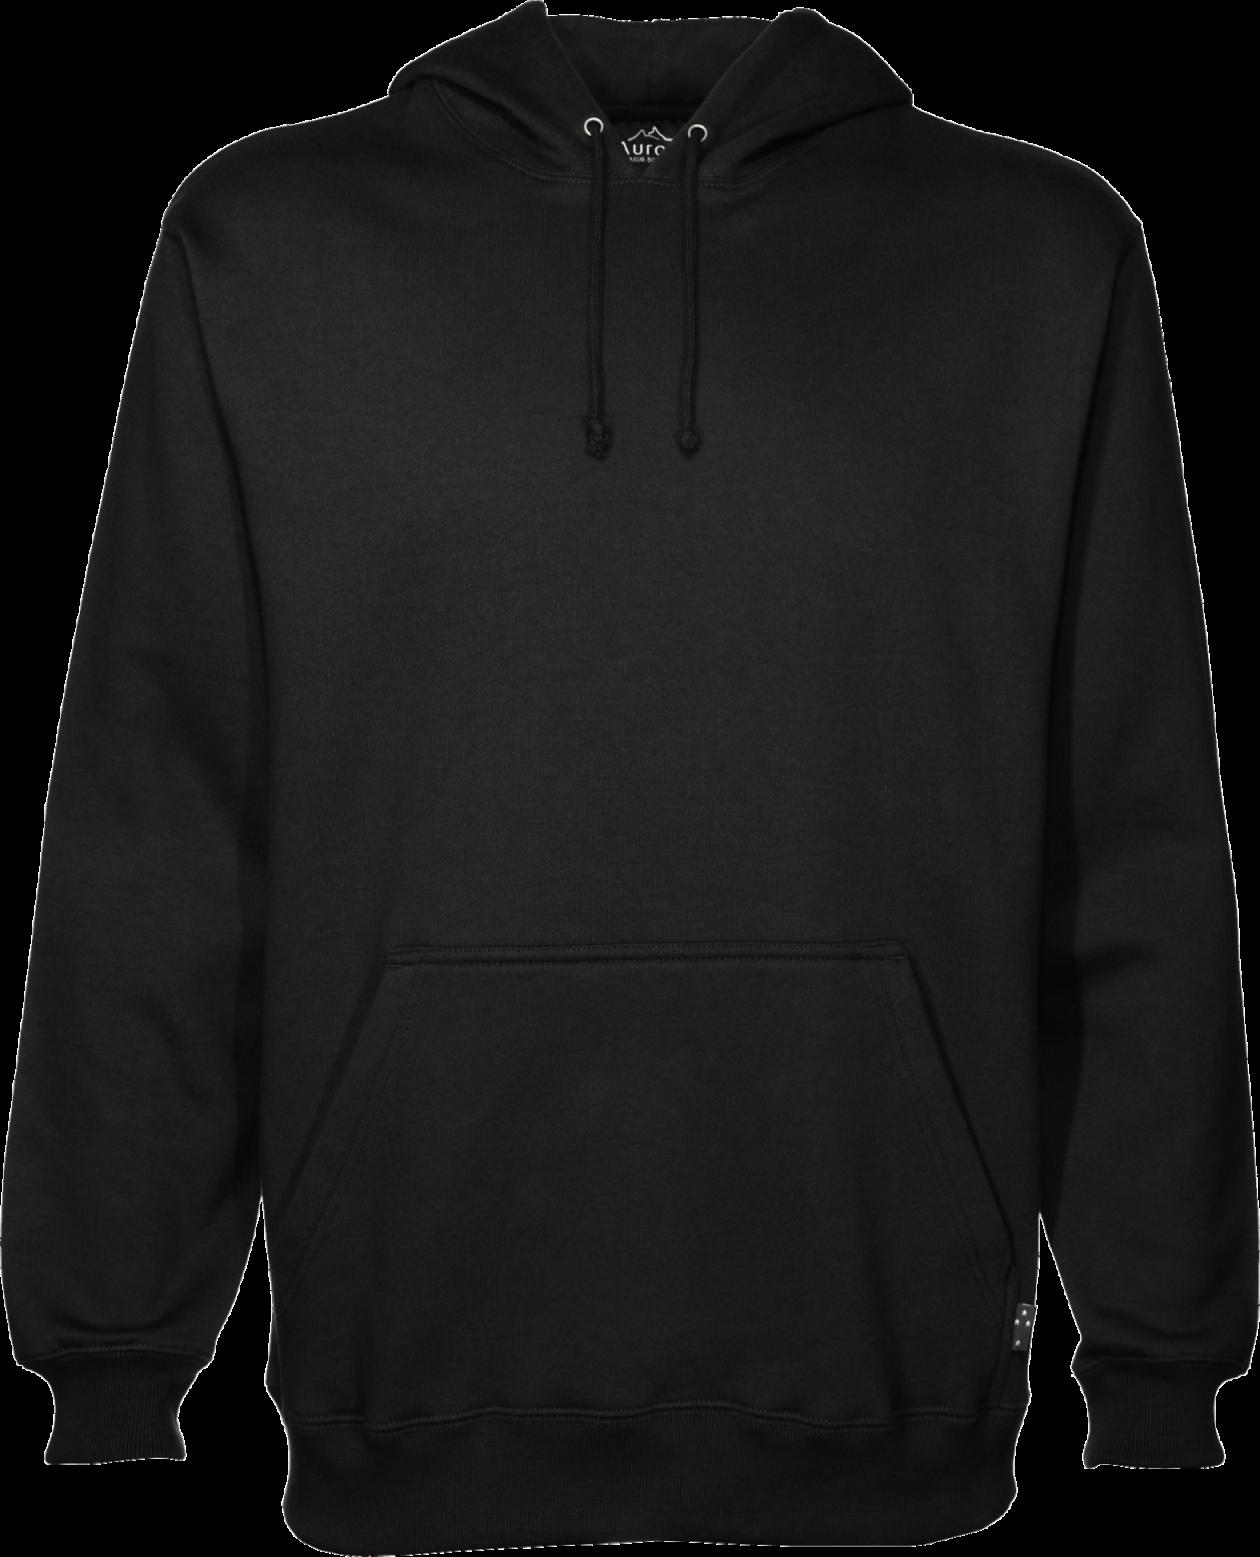 banner library stock transparent hoodie plain black #105909537